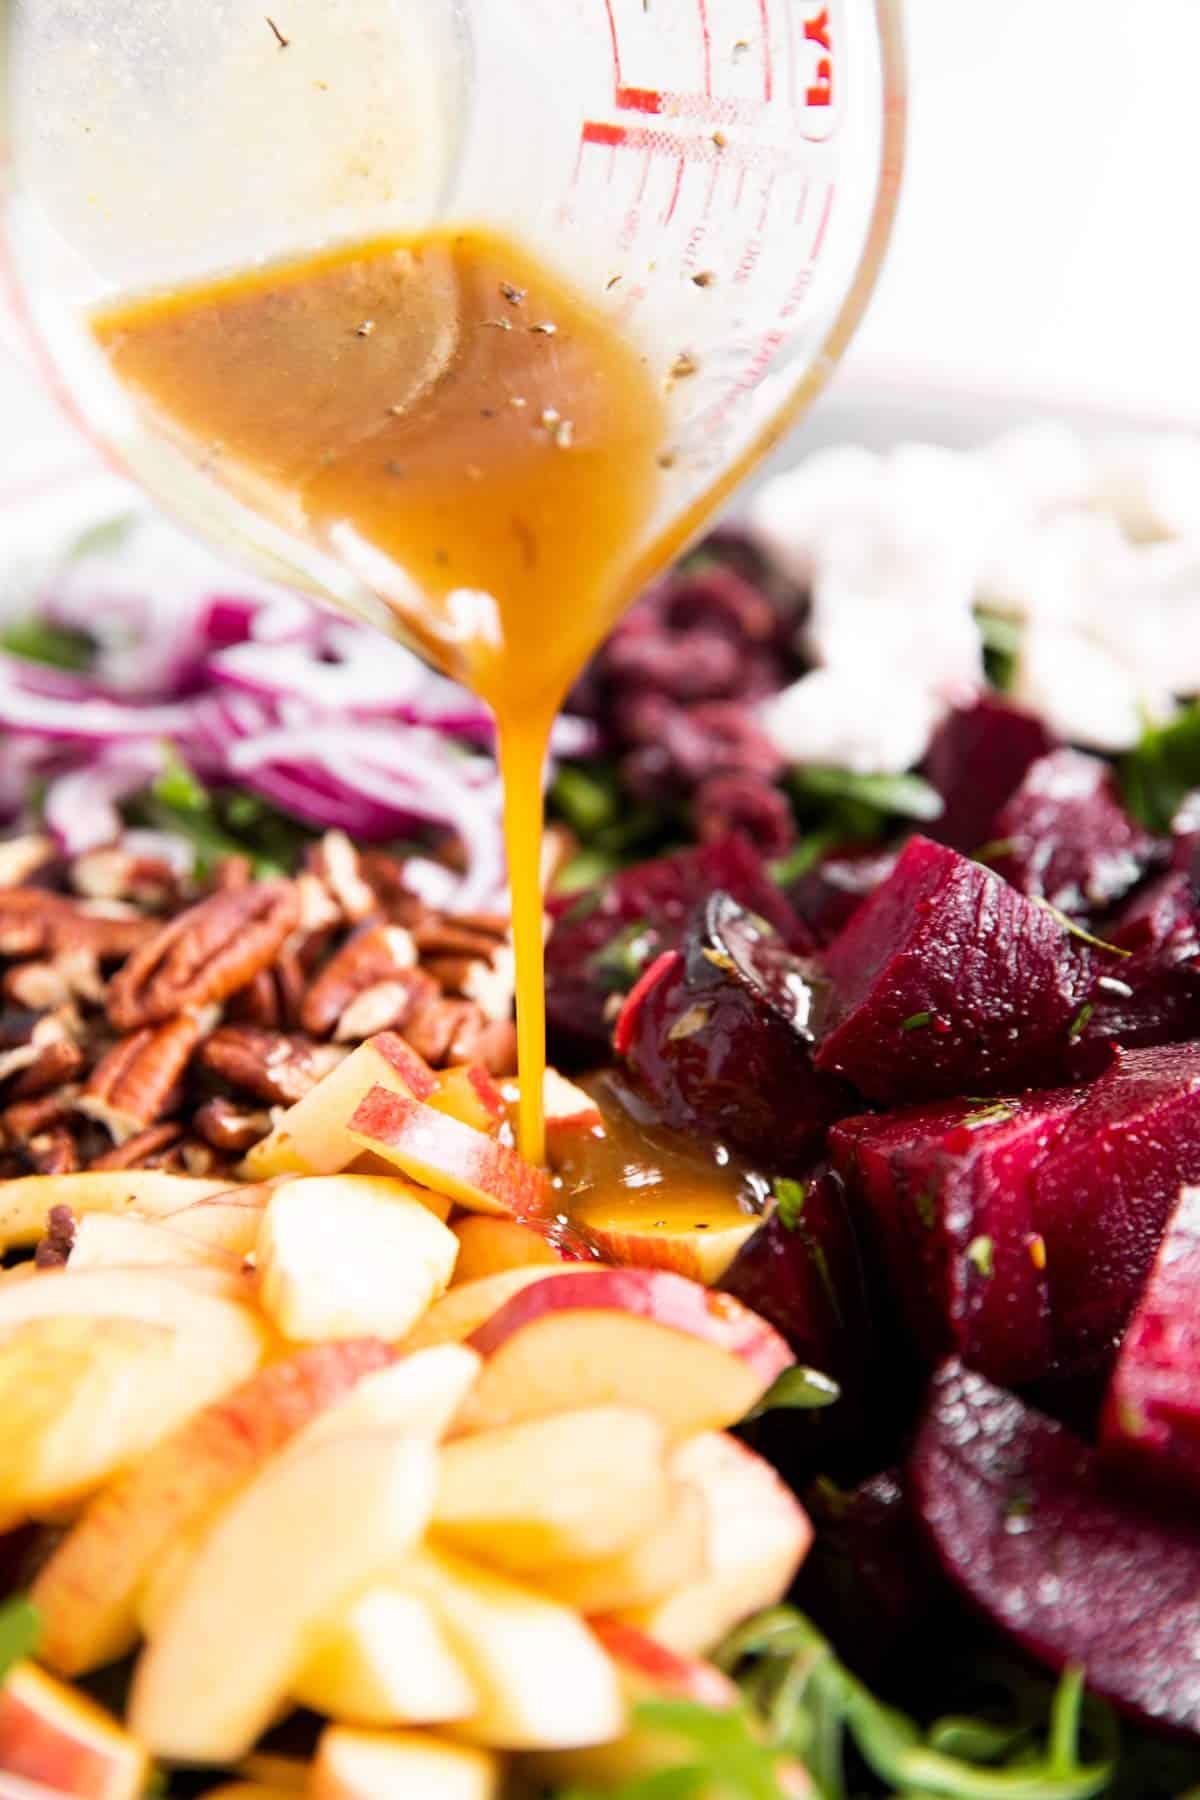 pouring salad dressing over ingredients for roasted beet salad